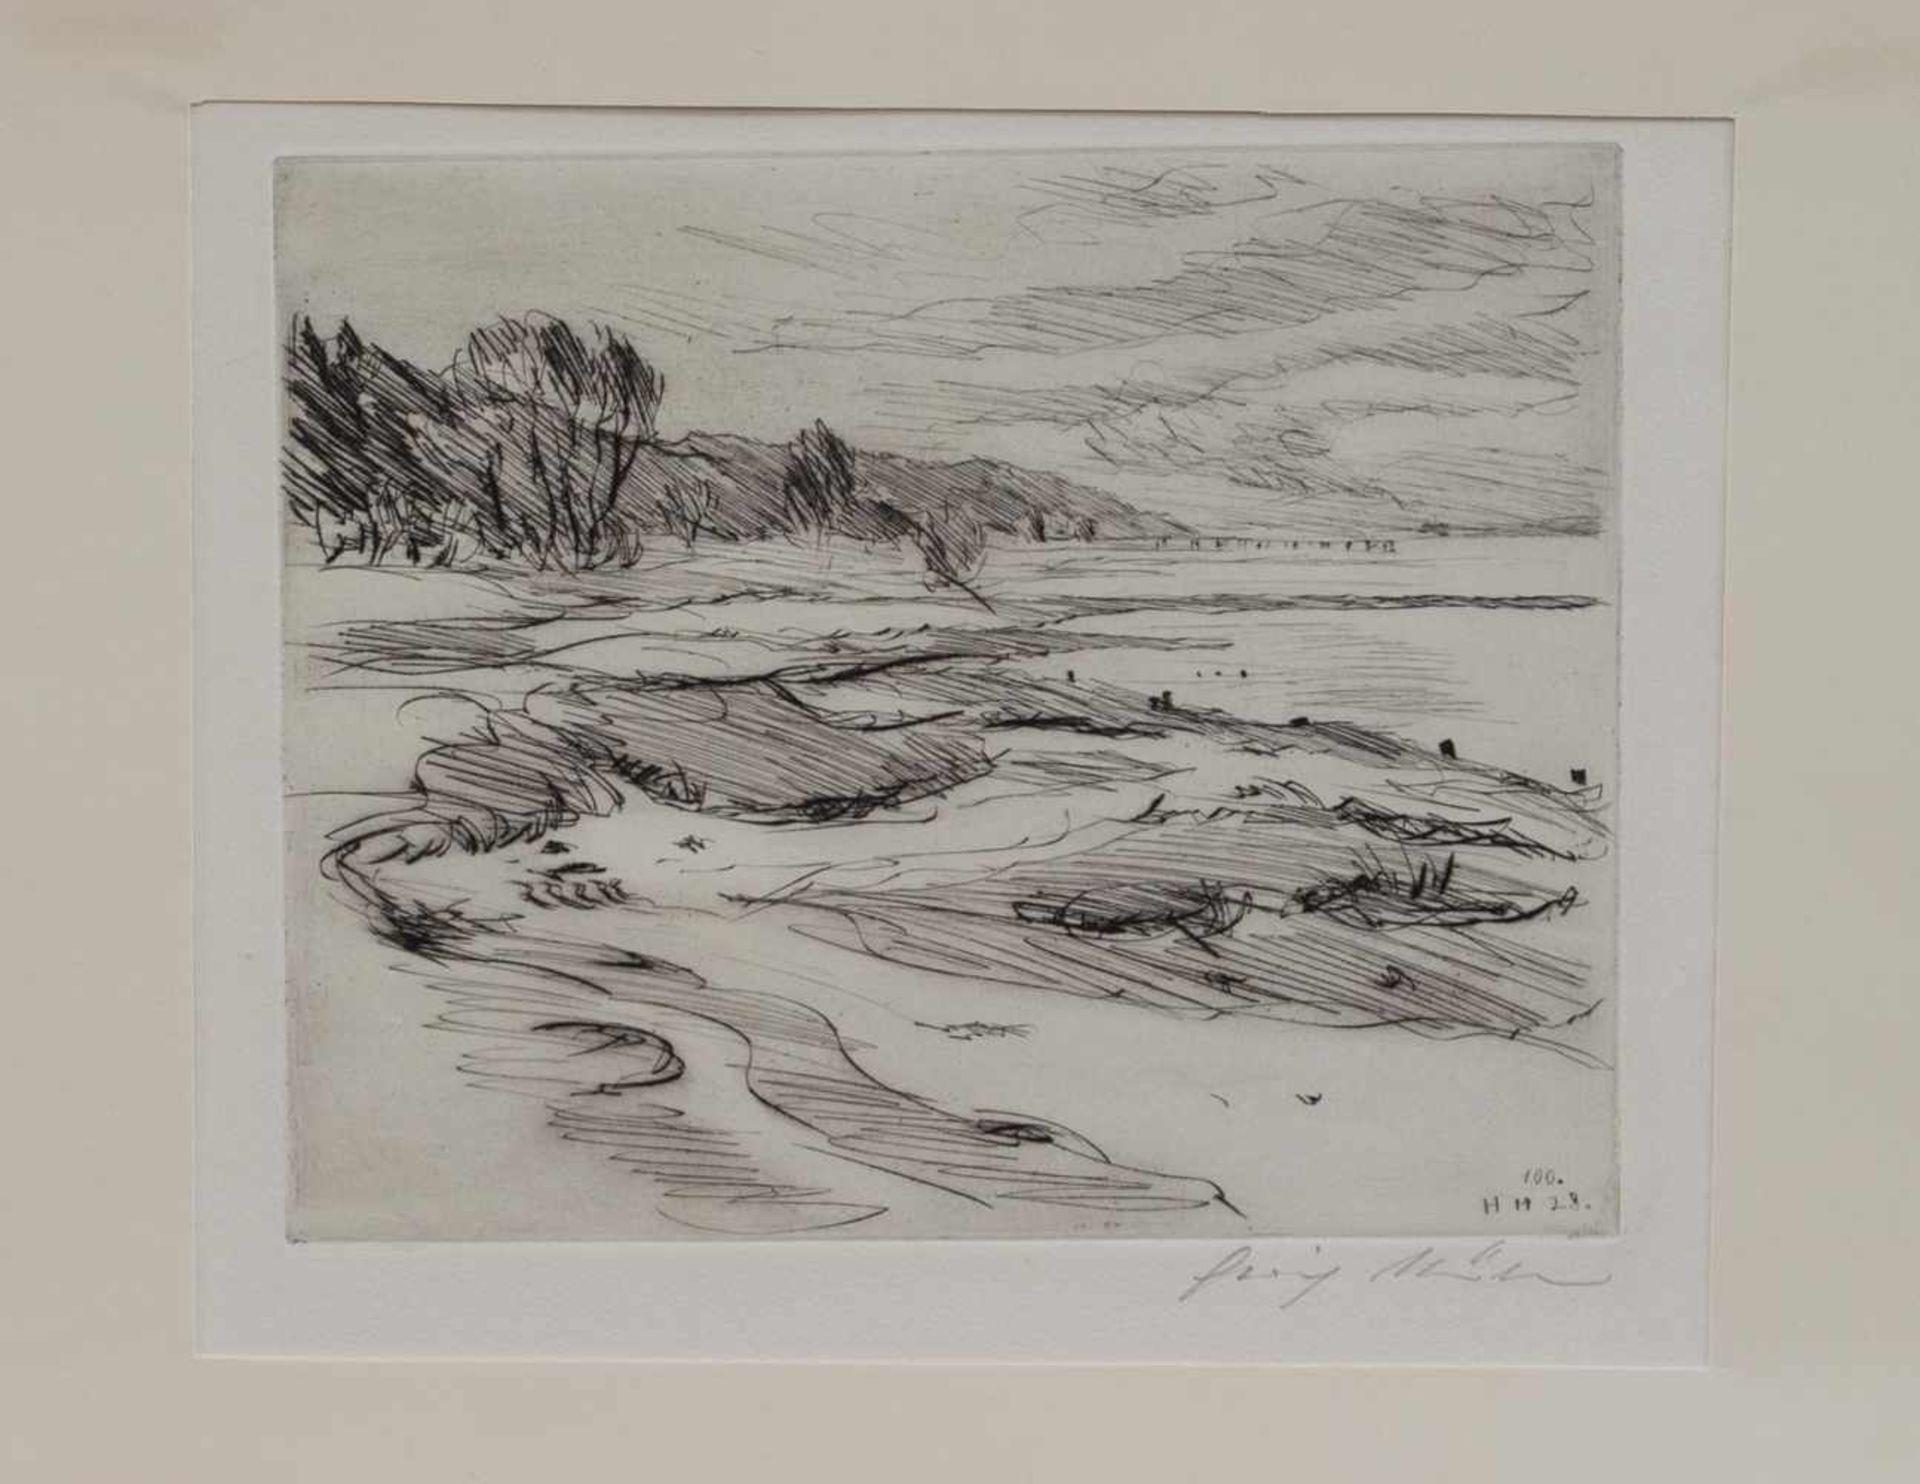 Los 33 - Heinrich Müller (Hamburger Landschaftsmaler, Zeichner u. Grafiker d. 19./ 20. Jh.) Elbstrand bei